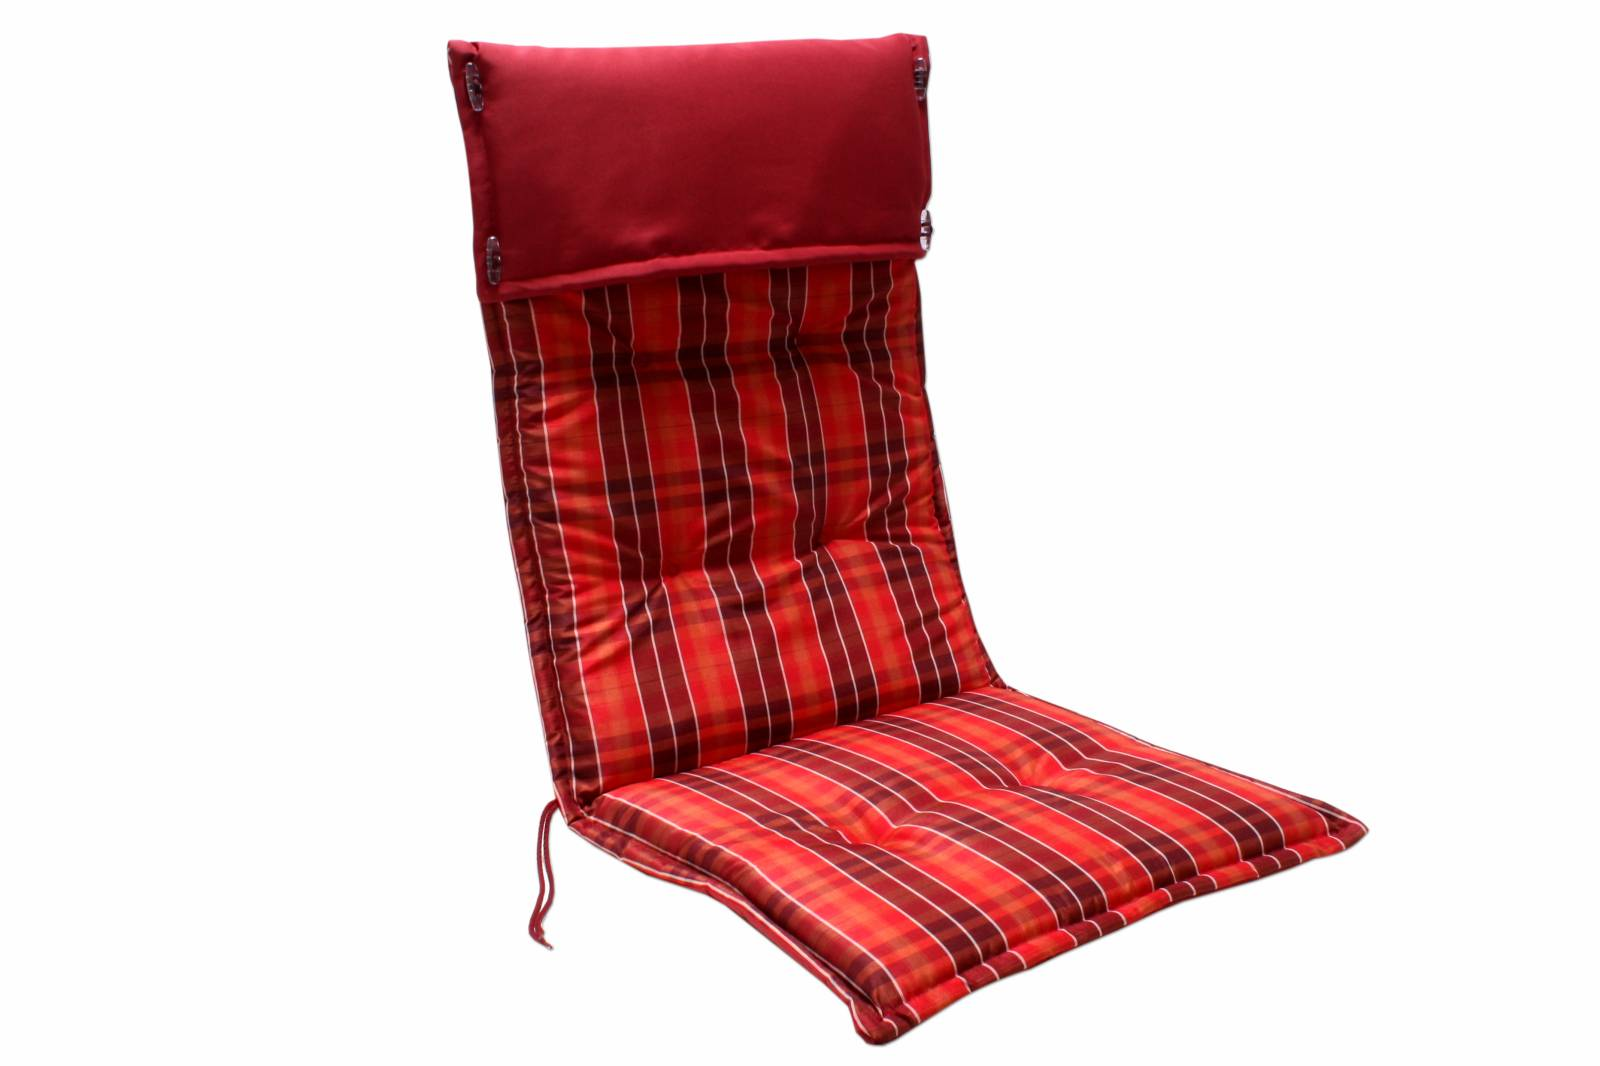 auflage gartenstuhl juist rot kariert hochlehner stuhl sessel kissen garten neu ebay. Black Bedroom Furniture Sets. Home Design Ideas